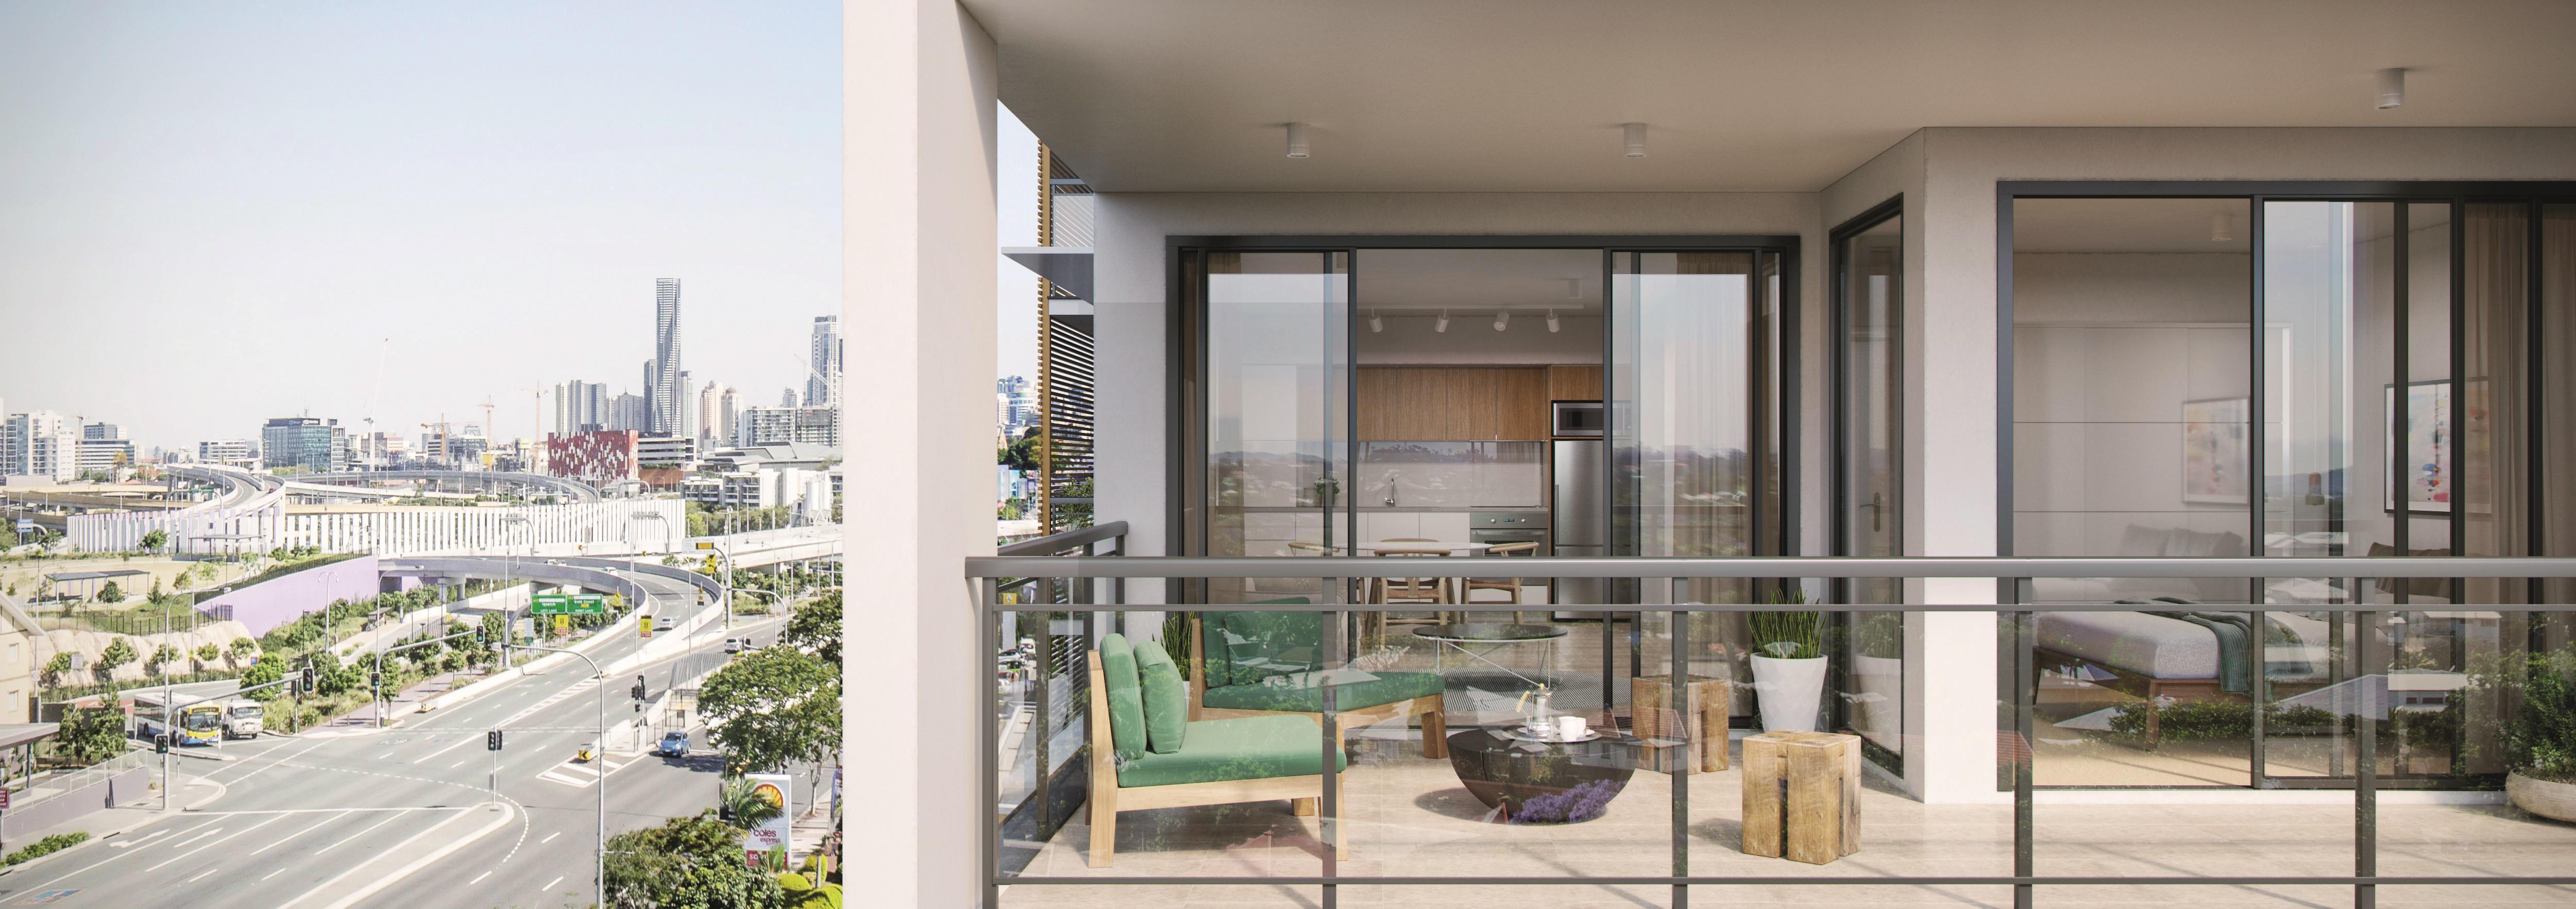 Mint Residences_Balcony